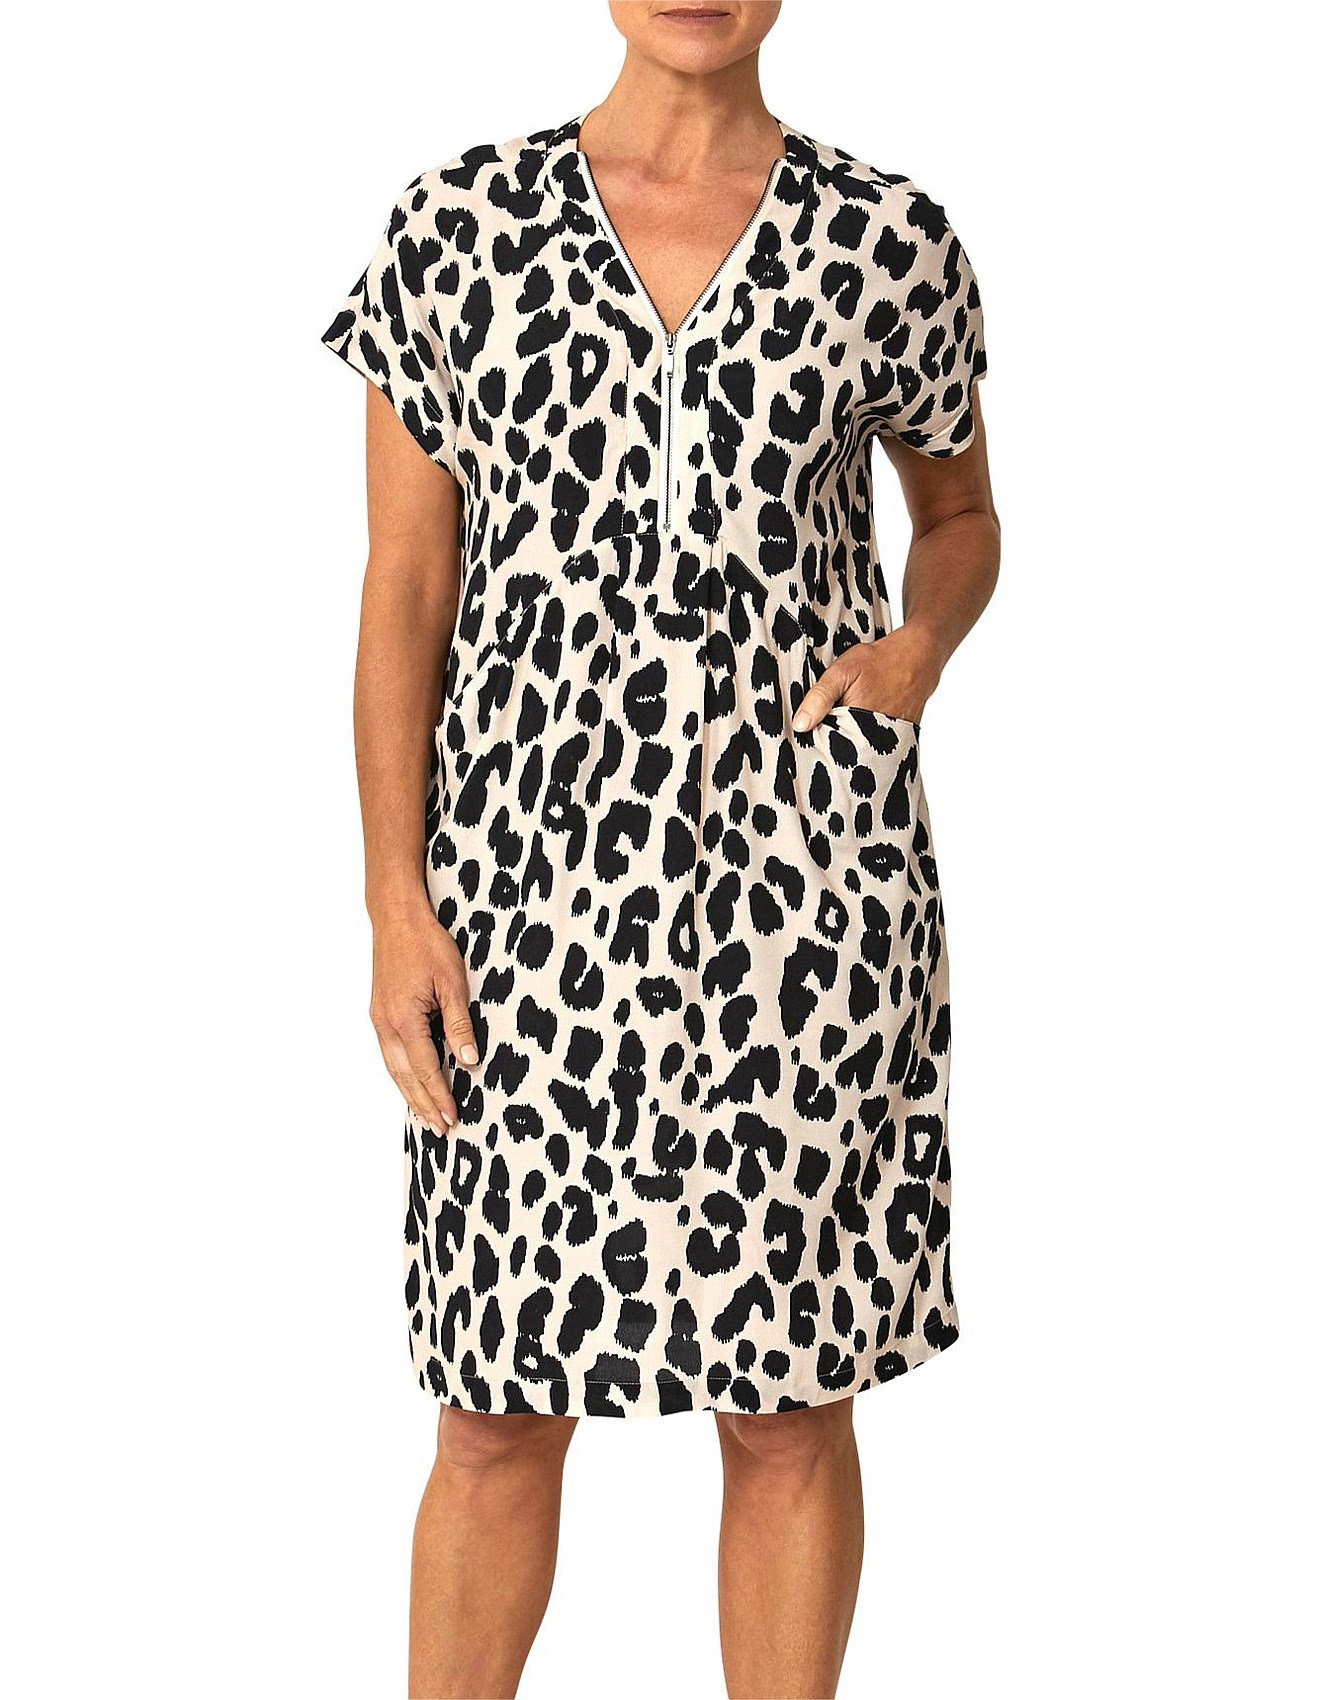 be90f6a017 Women - Short Sleeve Leo Print Dress